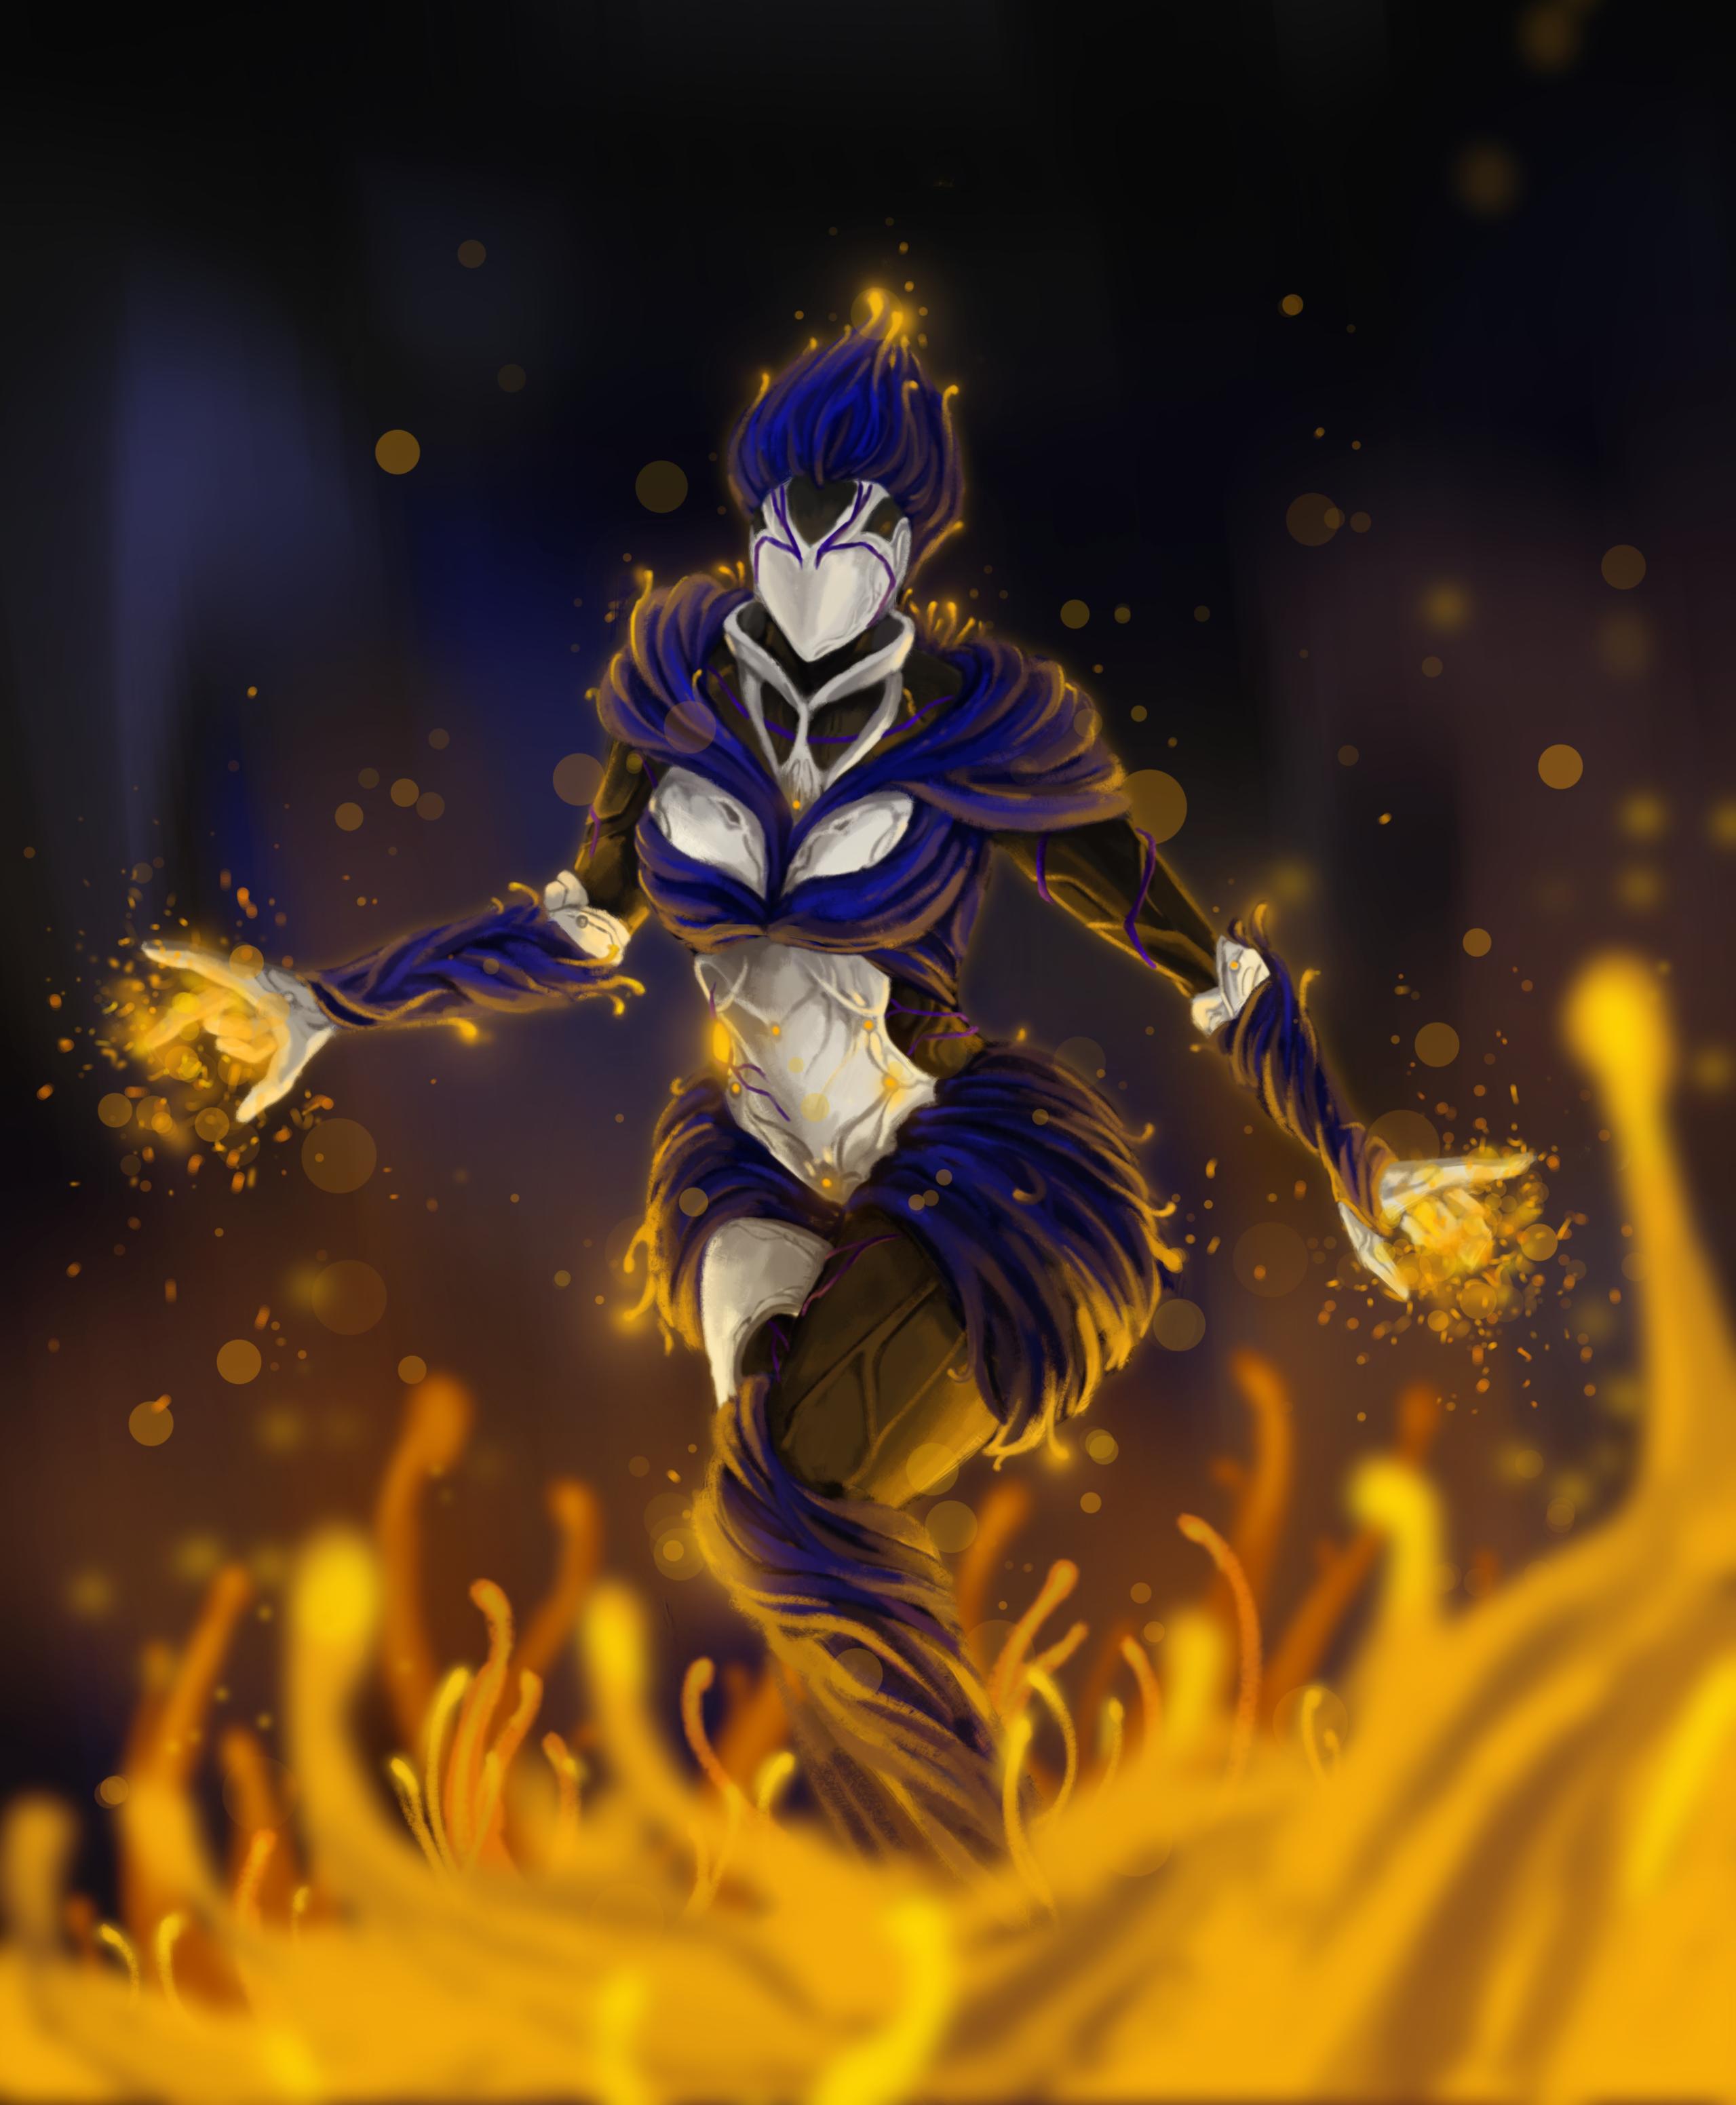 Saryn Deluxe (fan Concept) by Jarranna